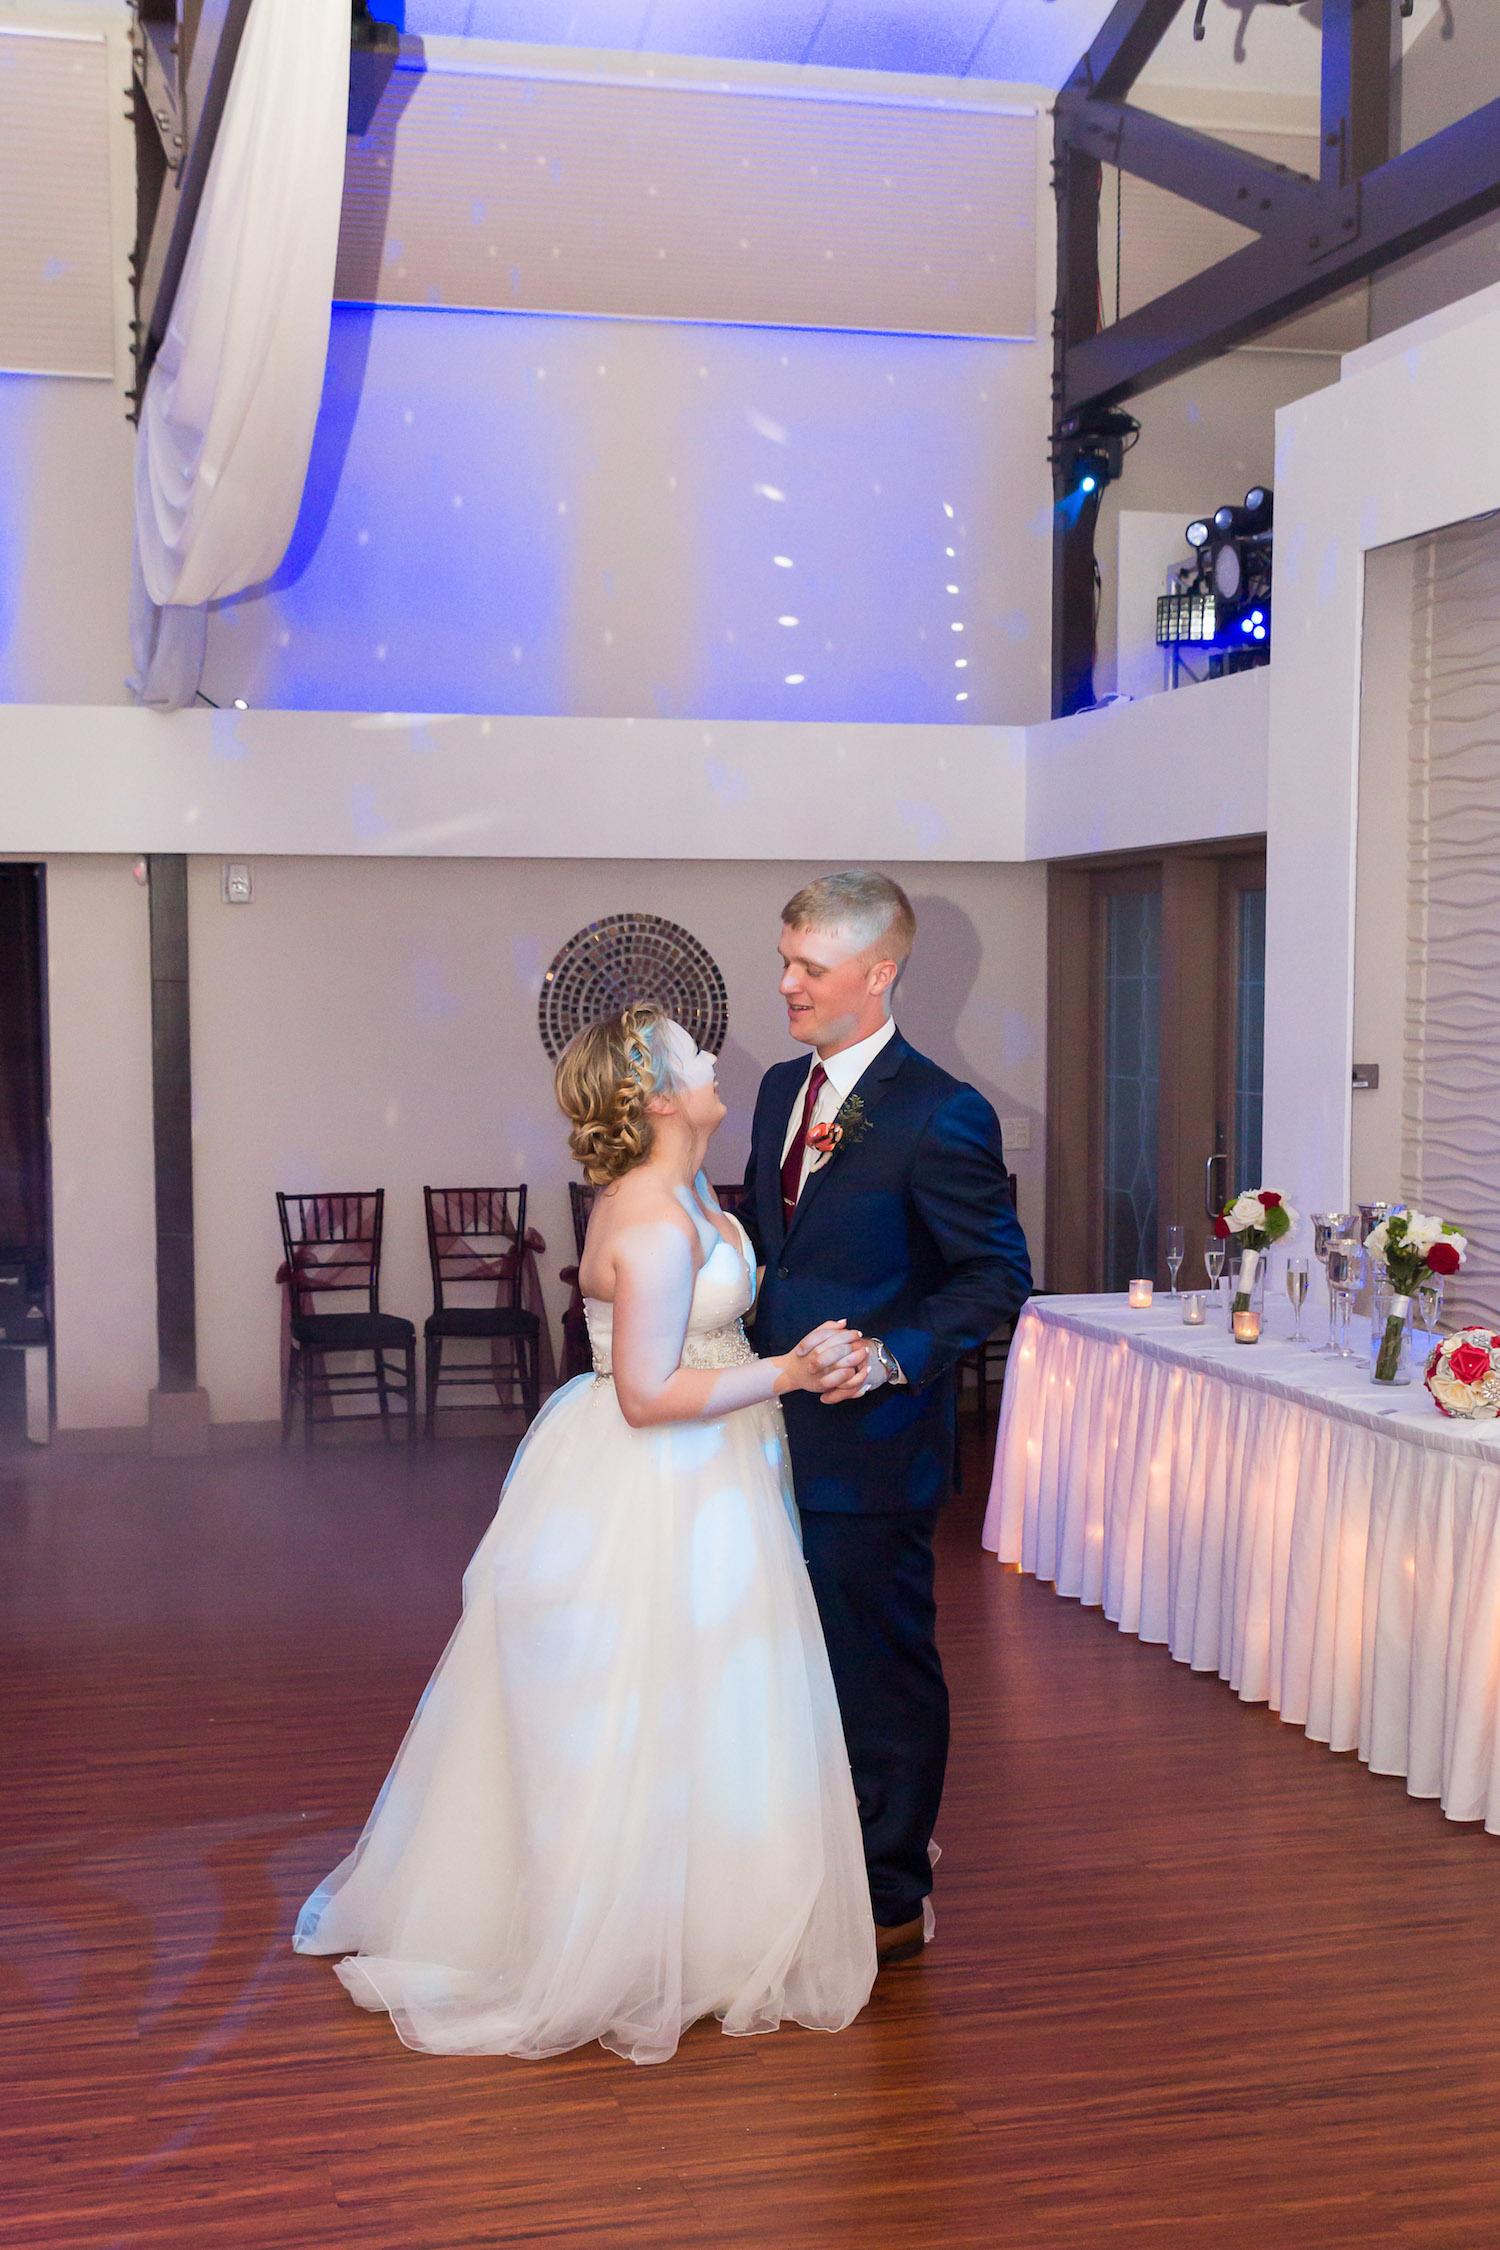 Rosehenge wedding, Lakeville wedding venue, affordable wedding venue in south Minnesota, first dance